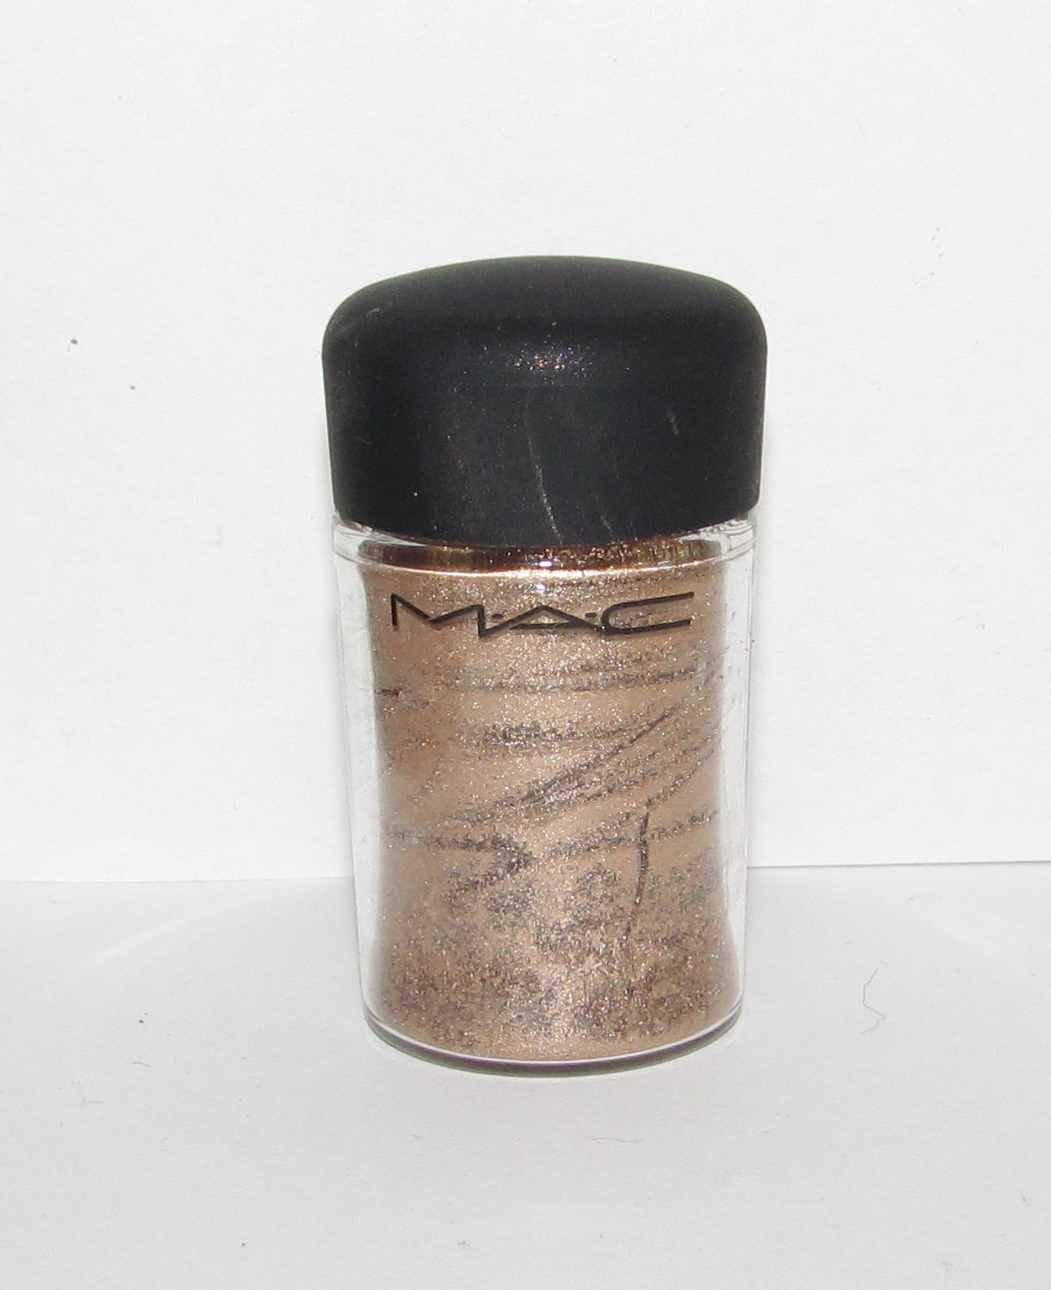 MAC - Blonde's Gold 1/4 tsp Pigment Sample w/Original Jar